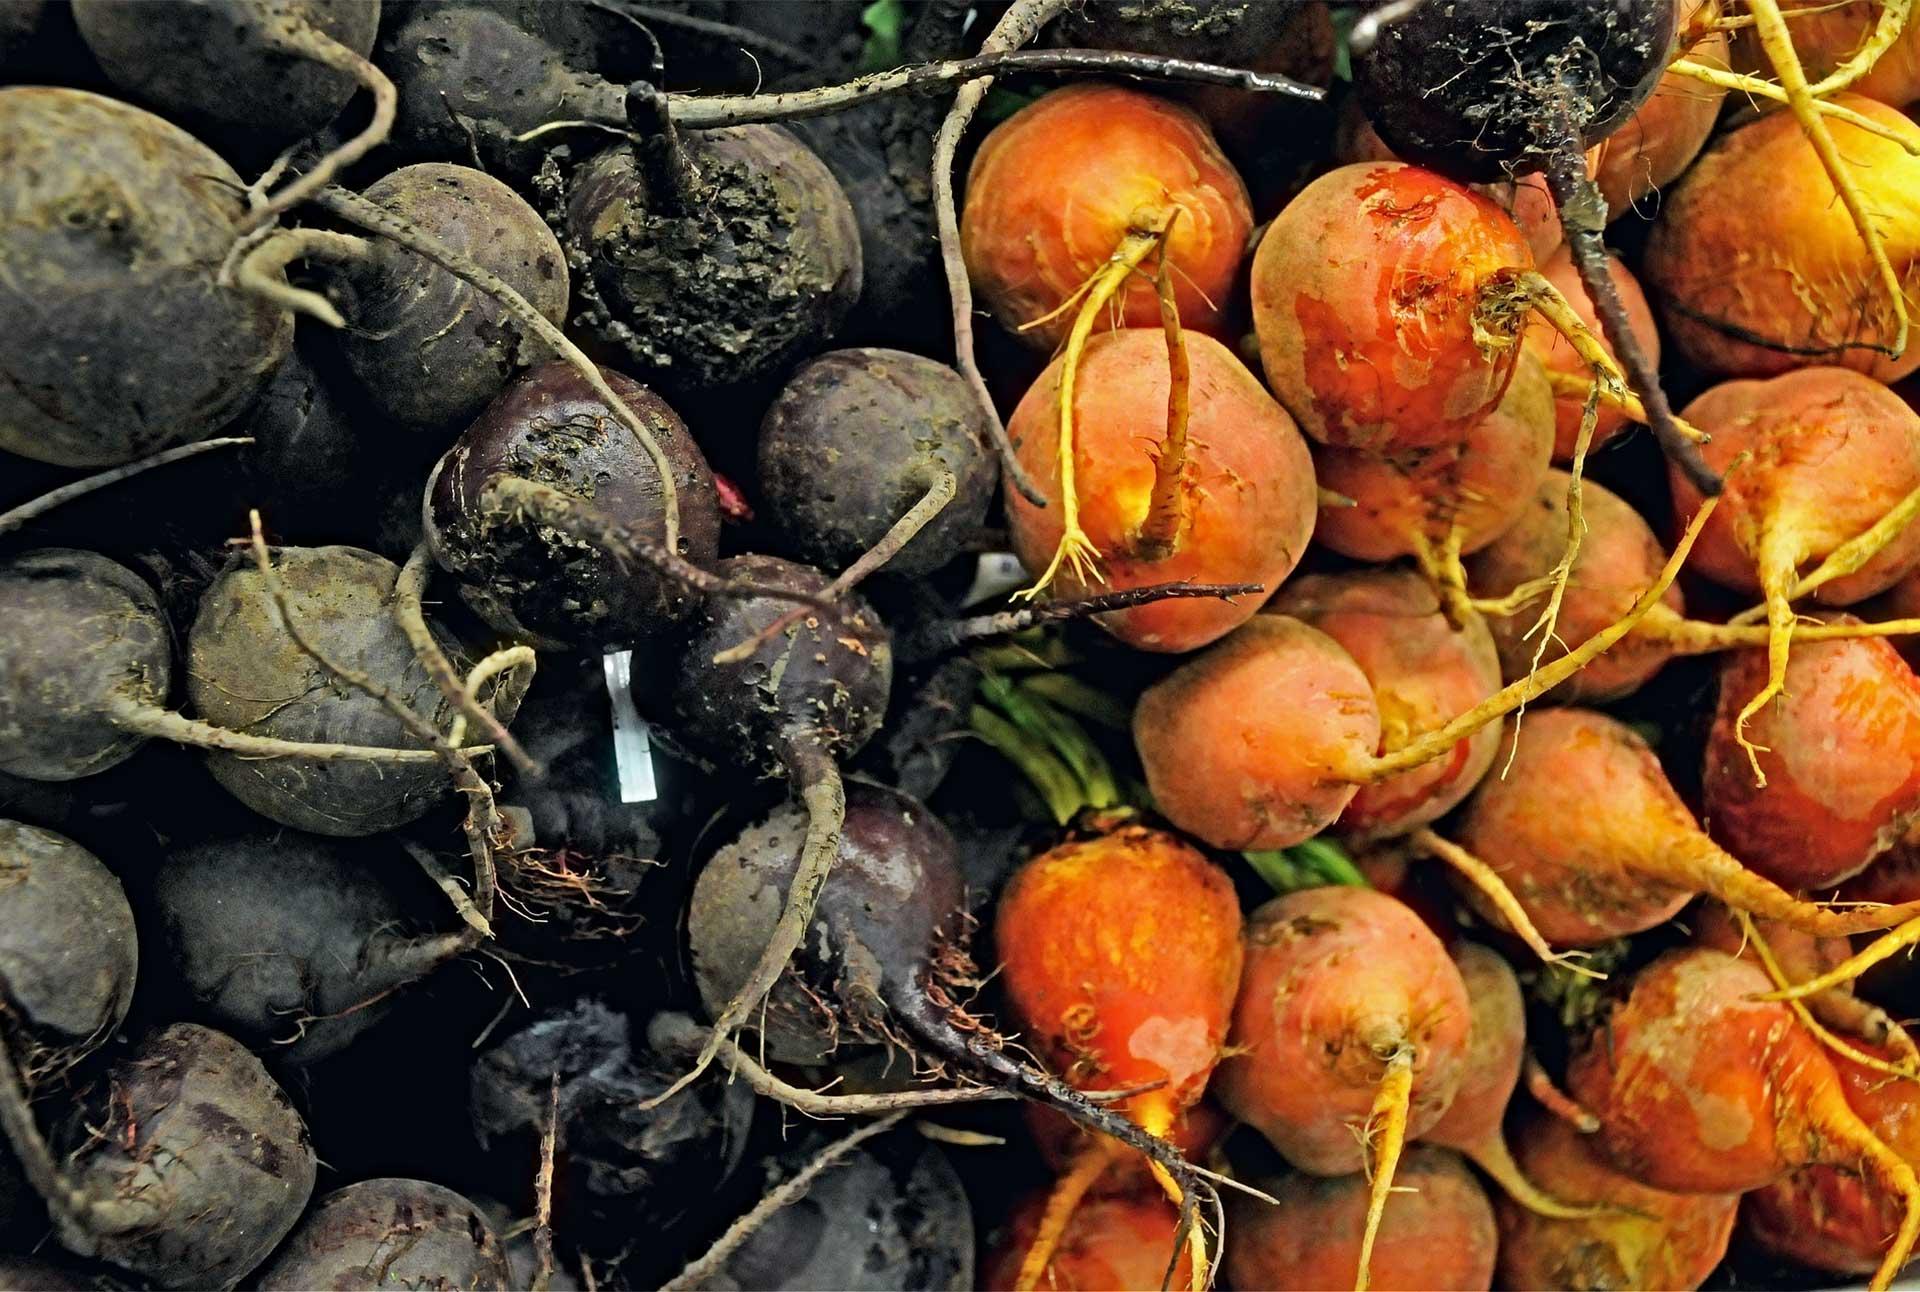 Farmlind Produce-Dagele Farms